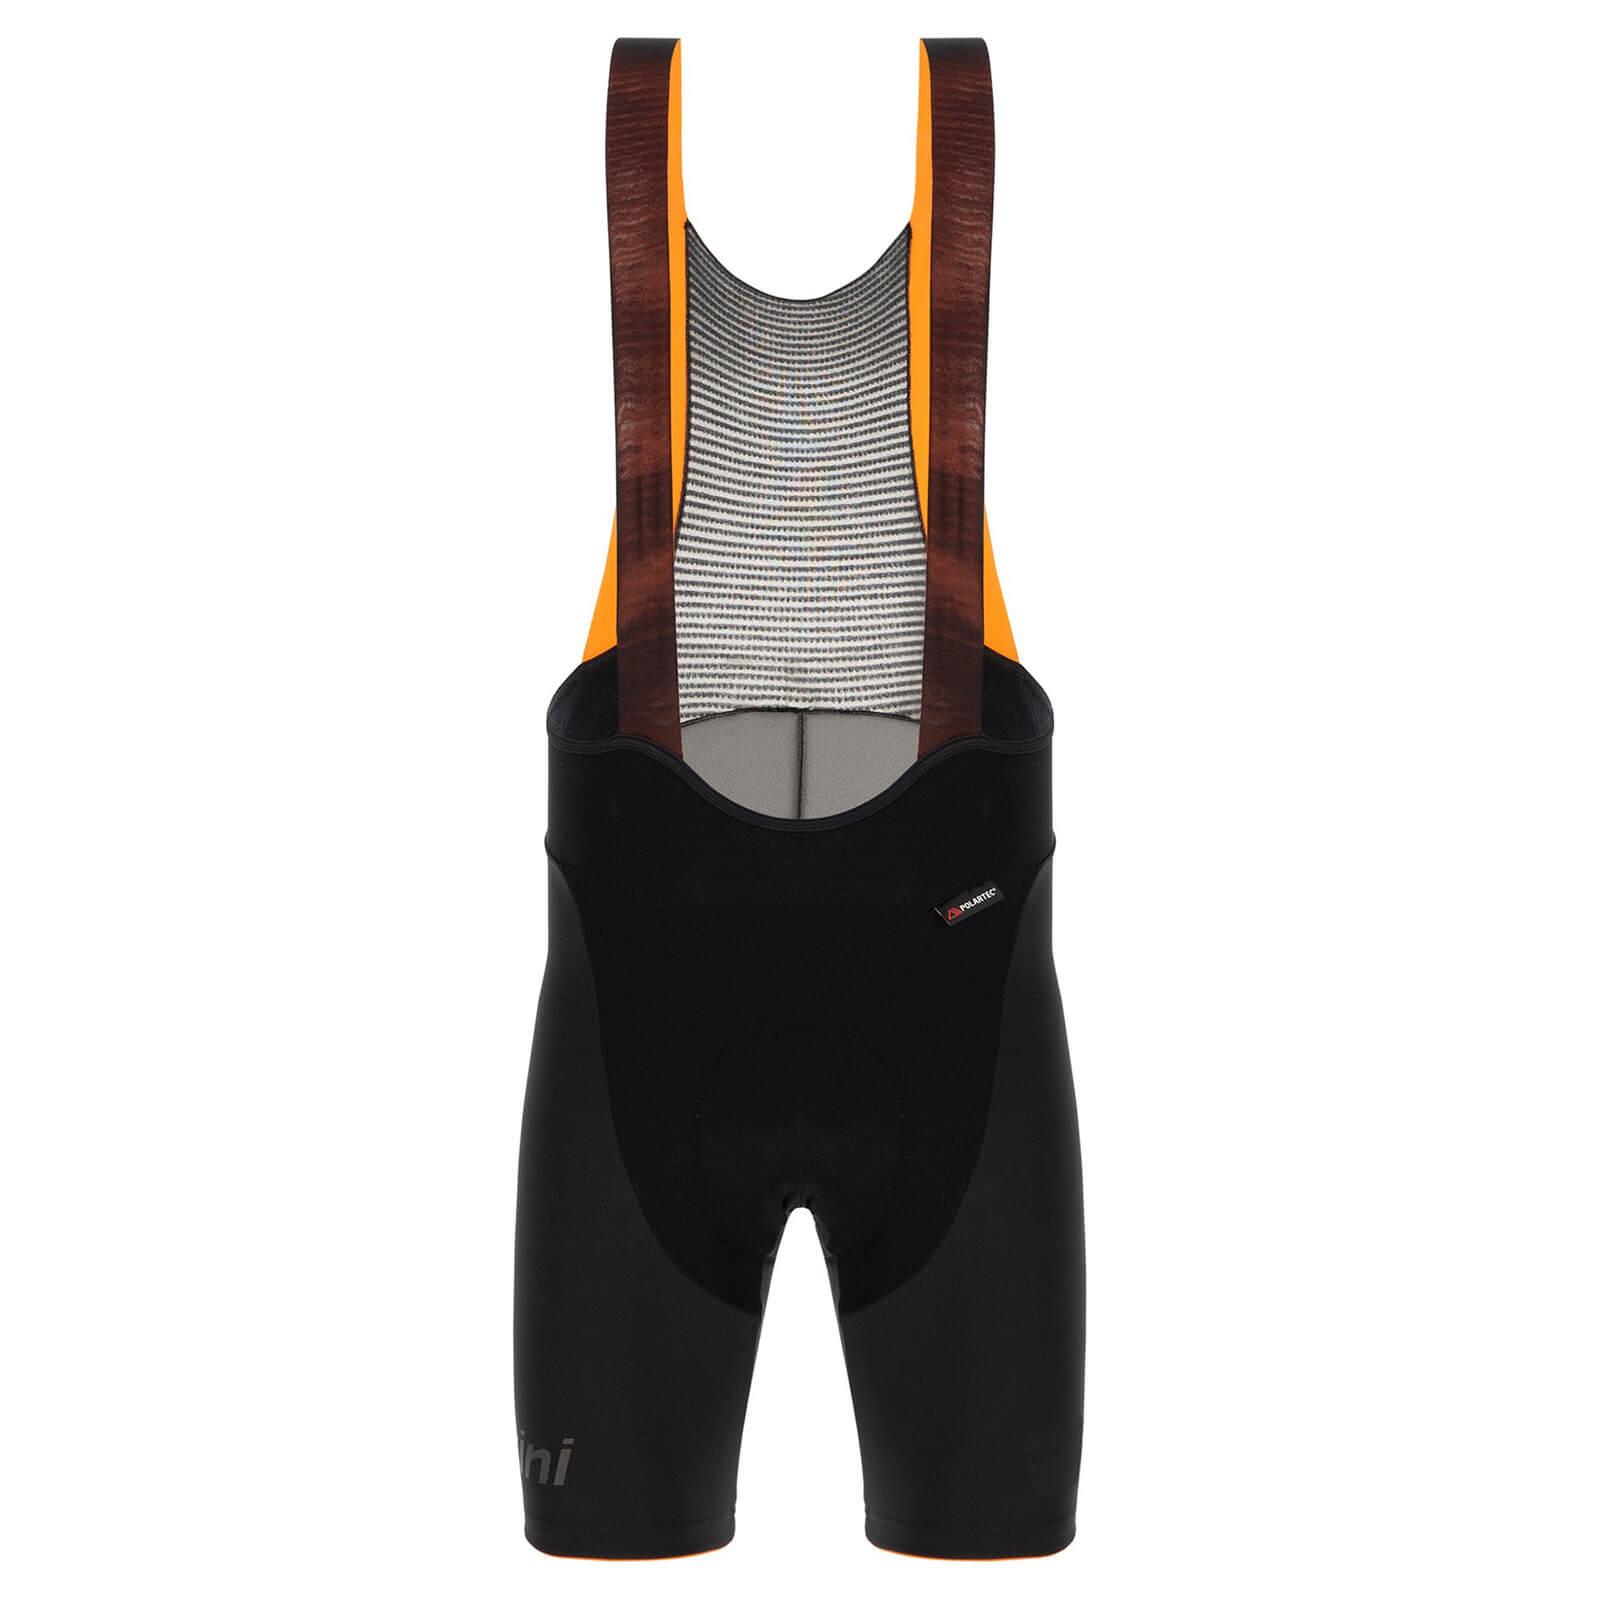 Santini Adapt Classics Bib Shorts - Black - XXL